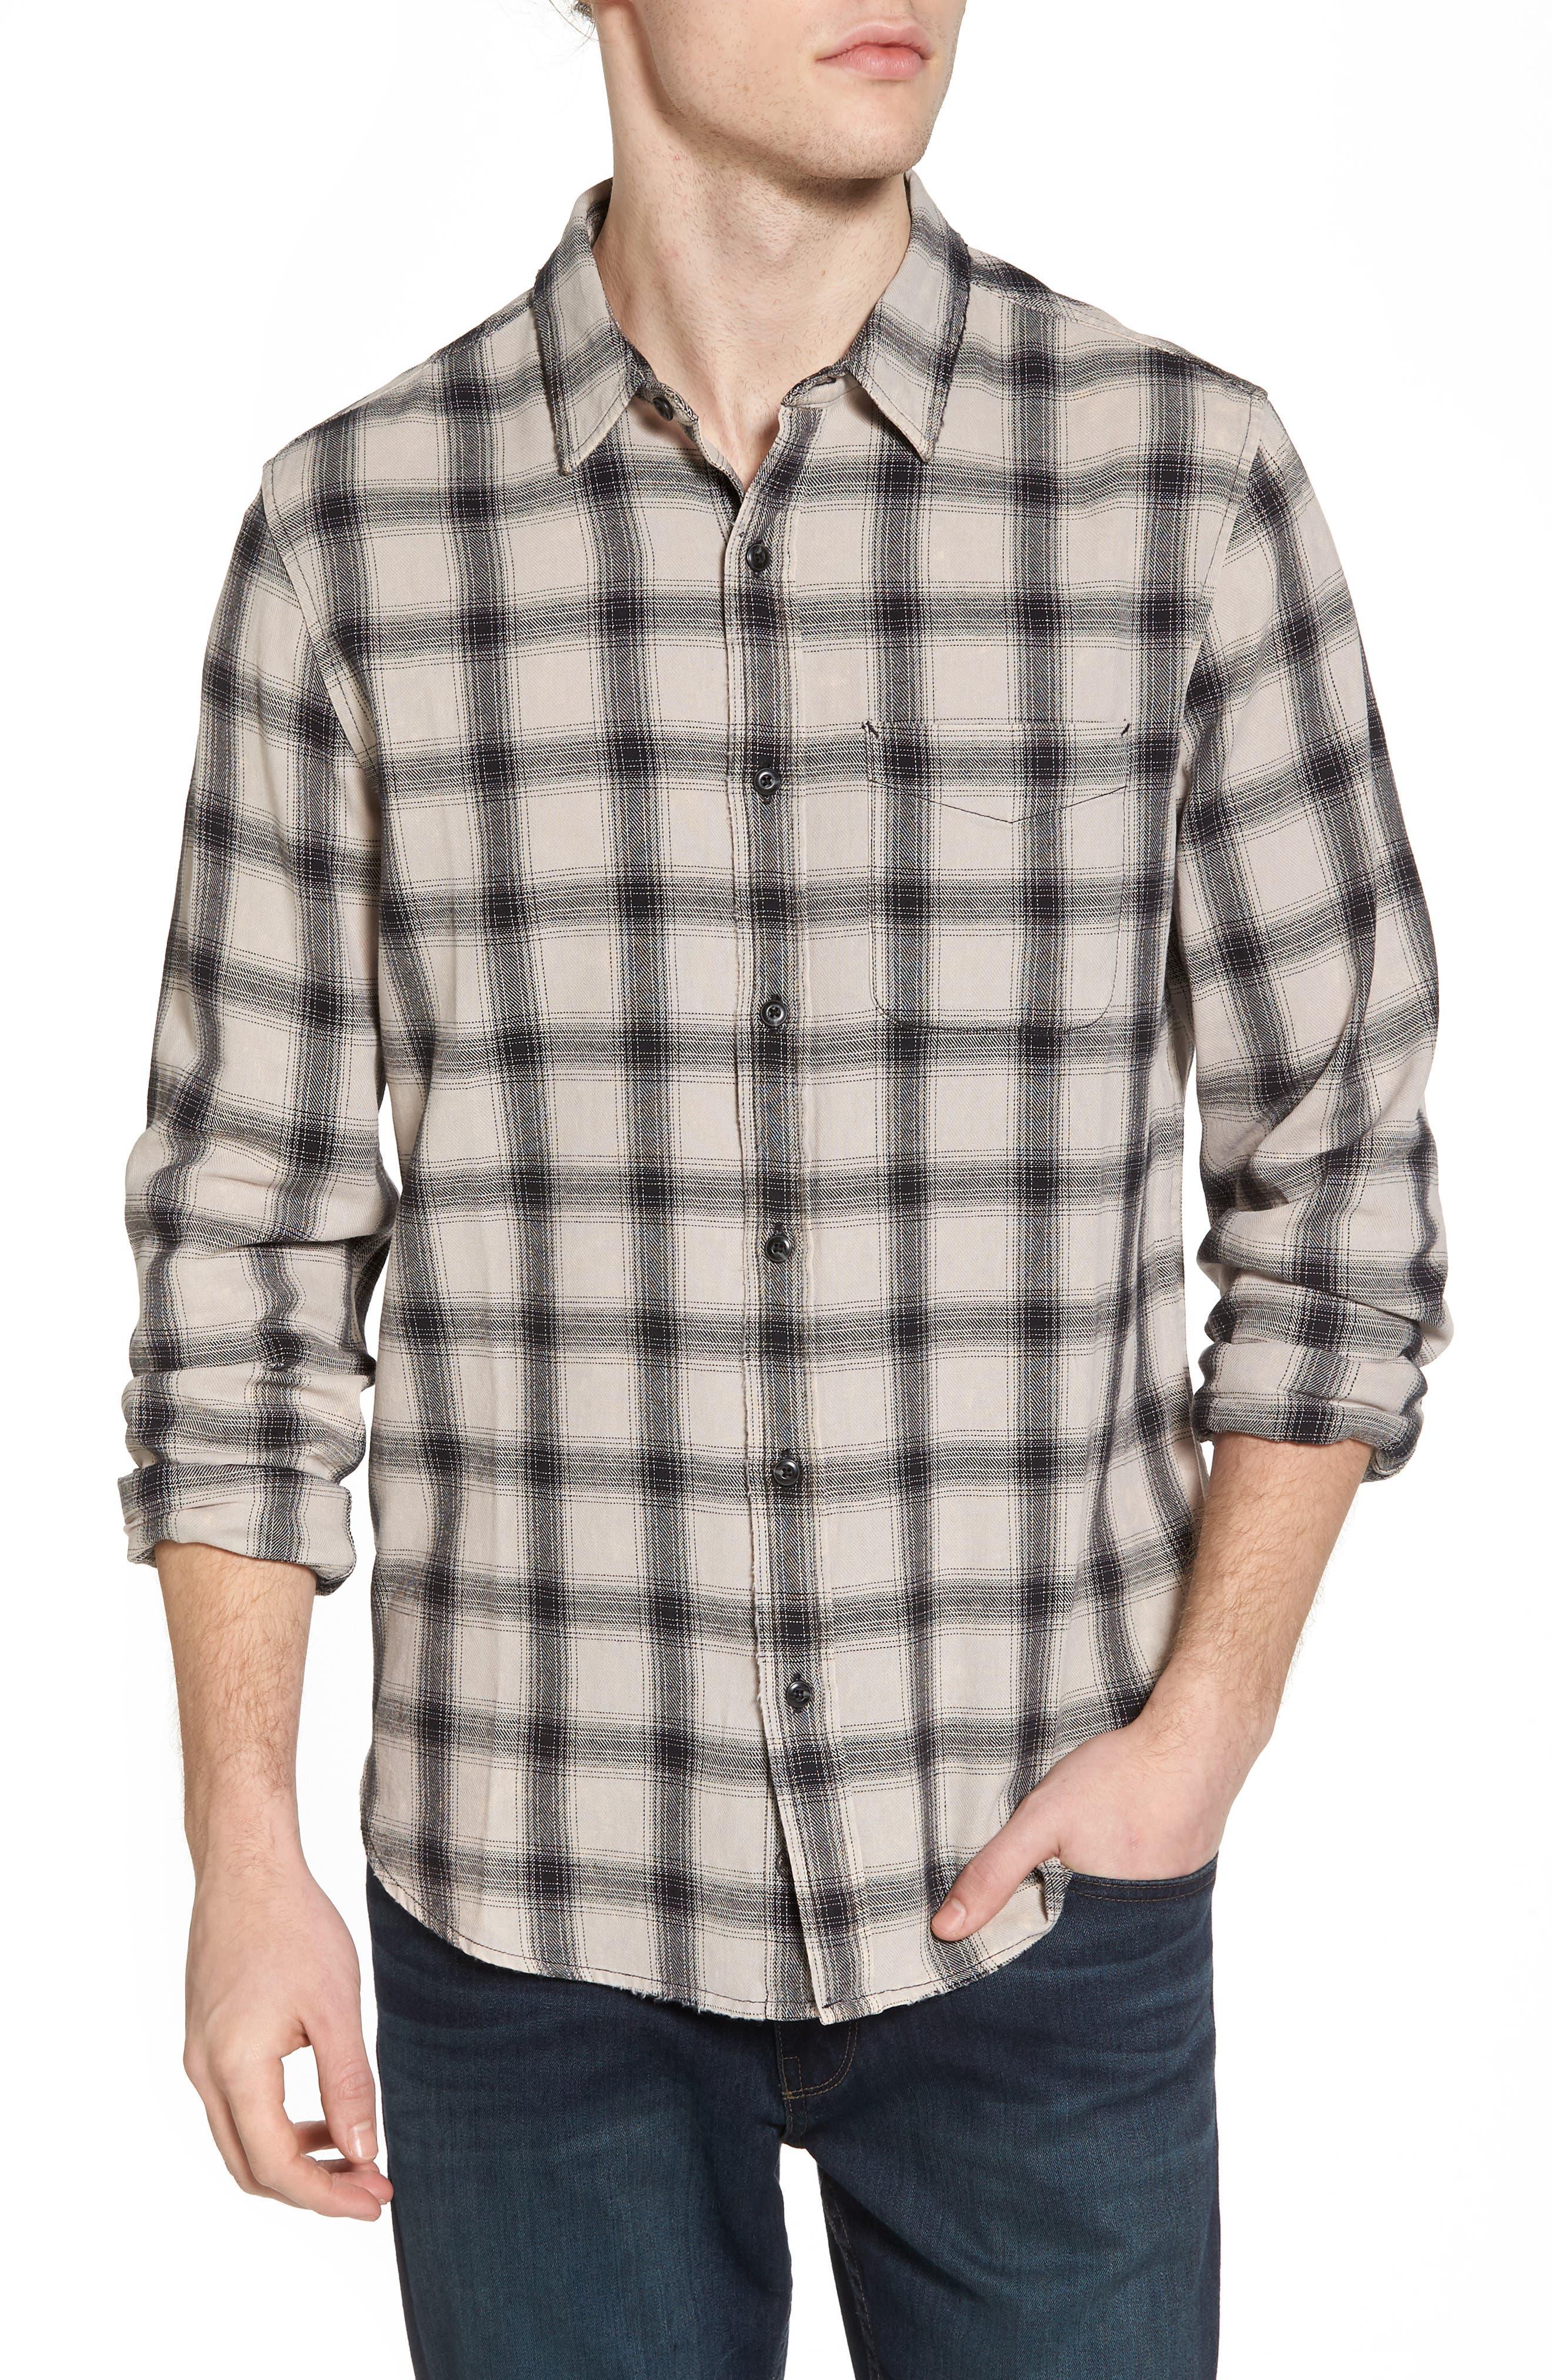 Colton Slim Fit Plaid Sport Shirt,                         Main,                         color, 15 Years Mineral Veil/ Black